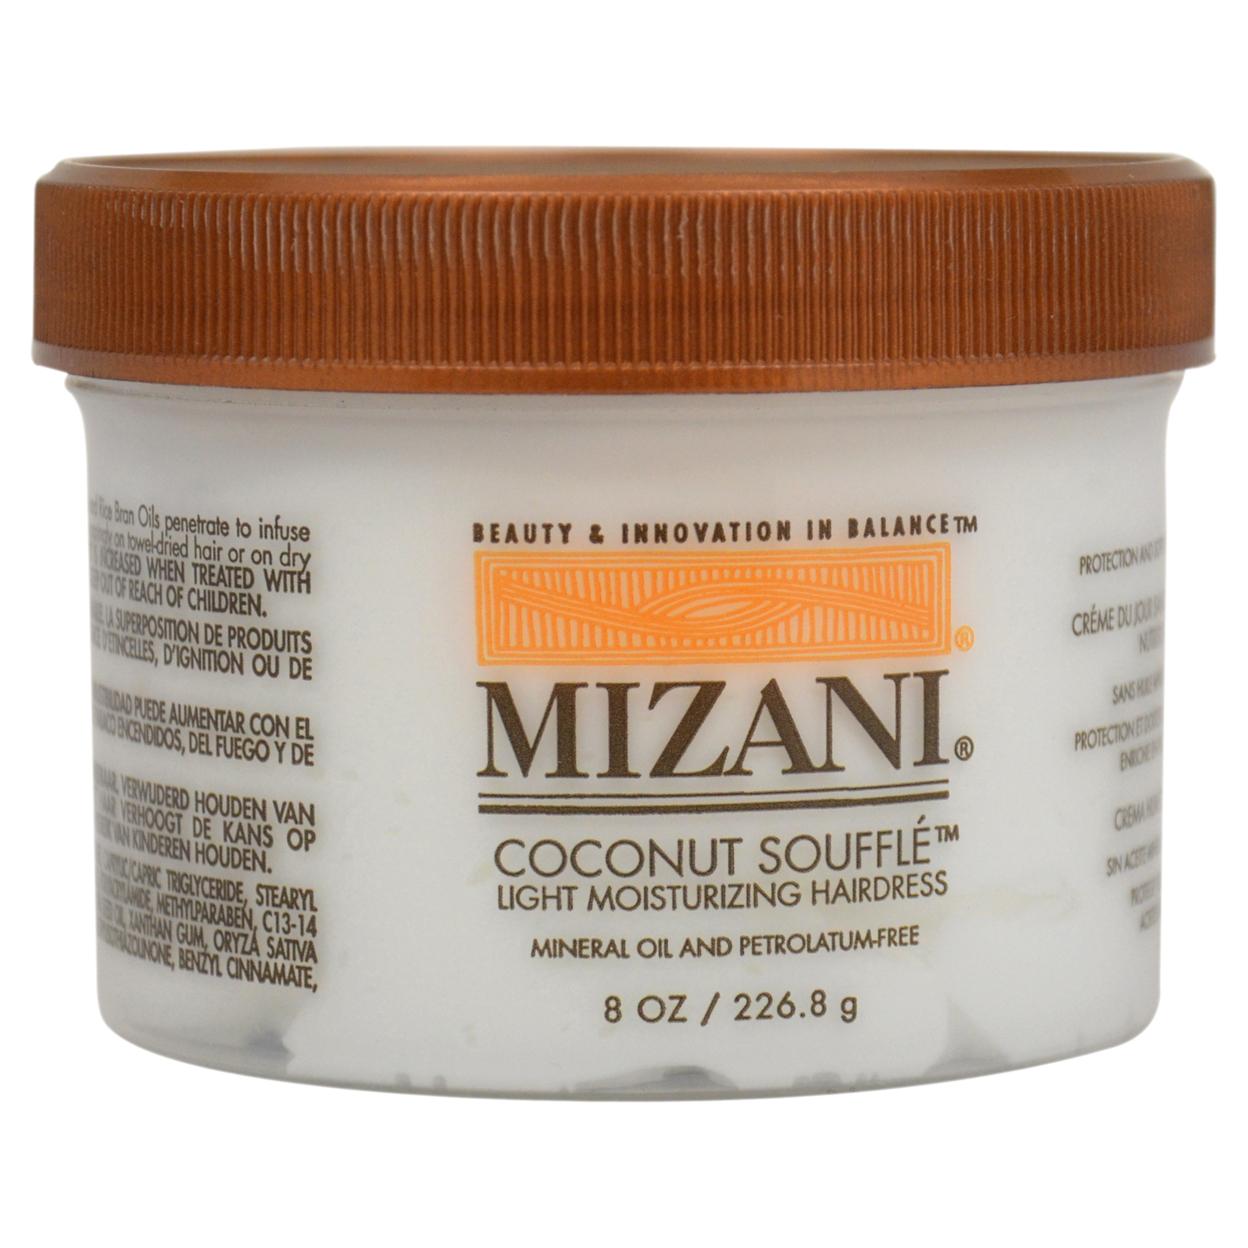 Coconut Souffle Light Moisturizing Hairdress by Mizani for Unisex - 8 oz Hairdress 5898e1bdc98fc450900ecd6e